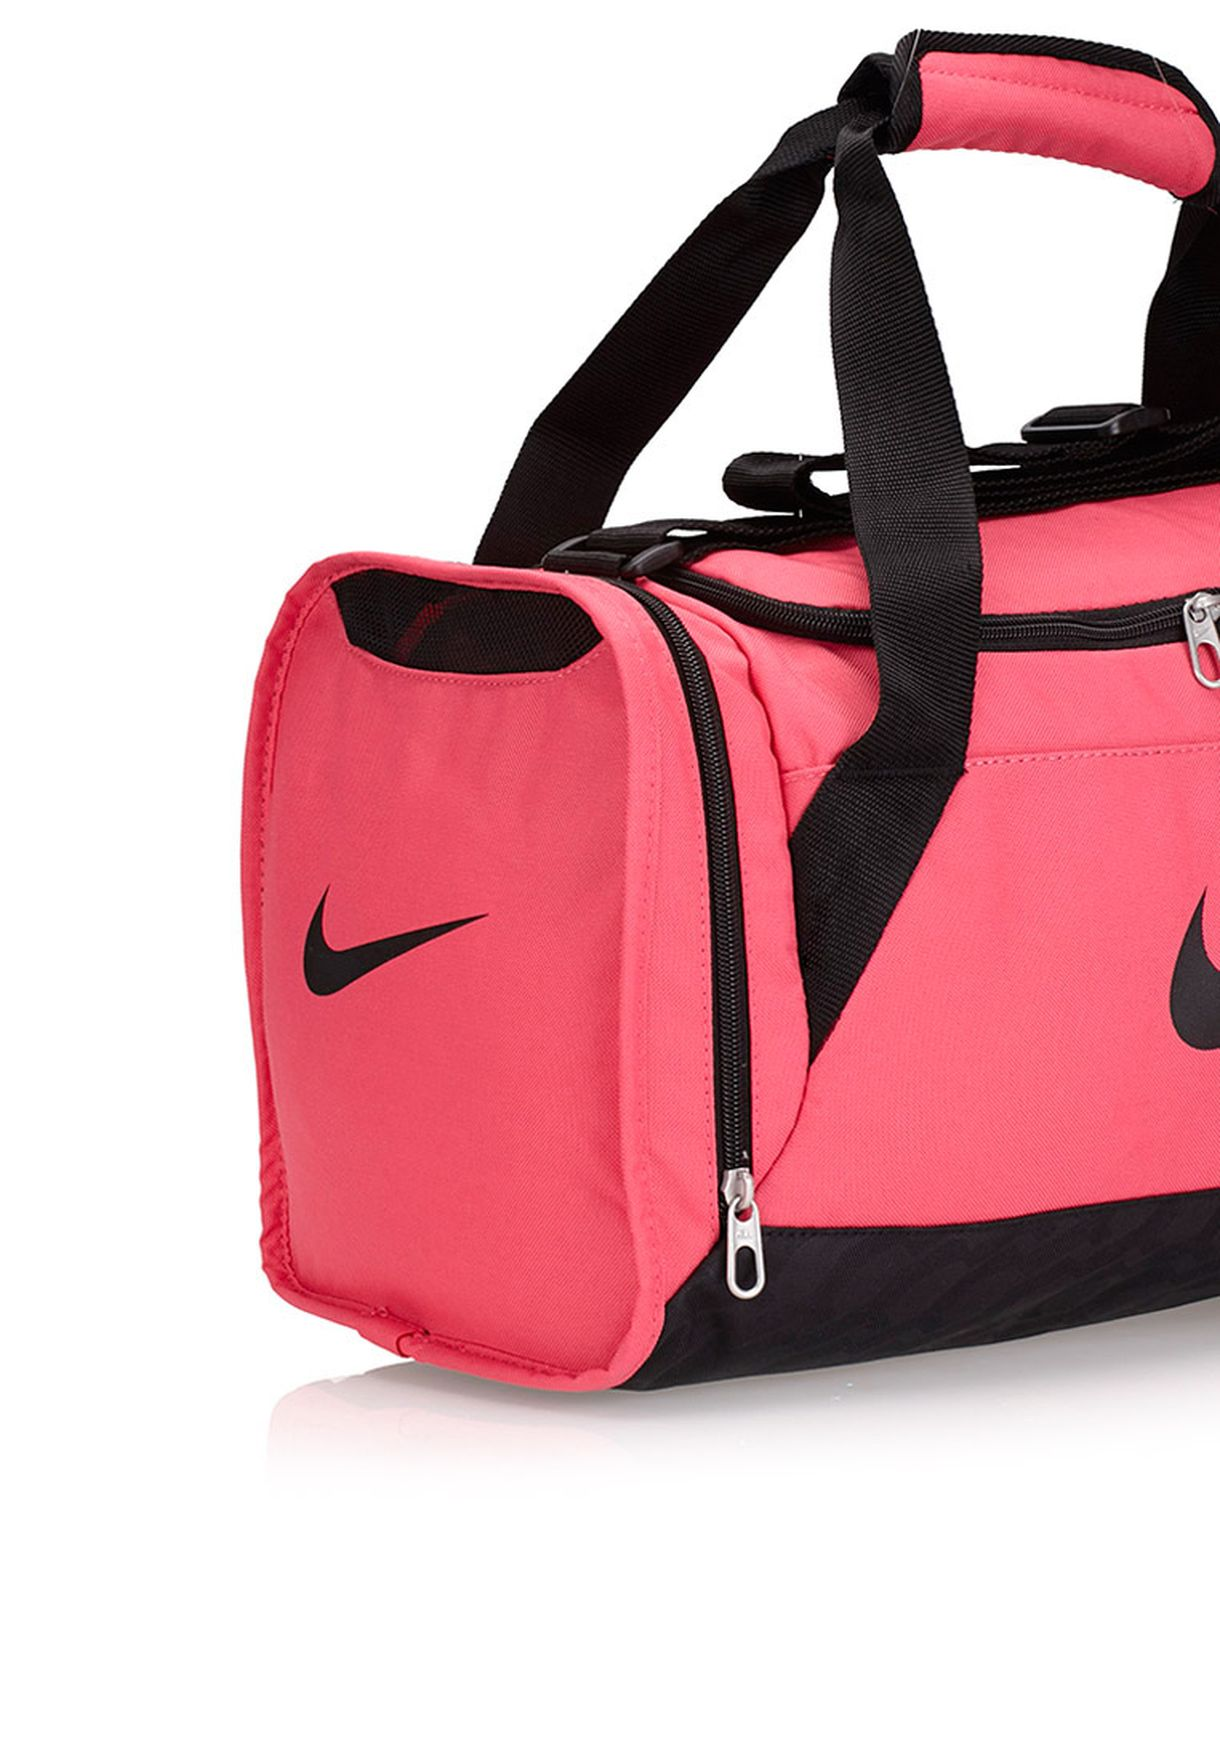 cc7a571cad9a Shop Nike pink Extra Small Brasilia 6 Duffel Bag BA4911-606 for ...